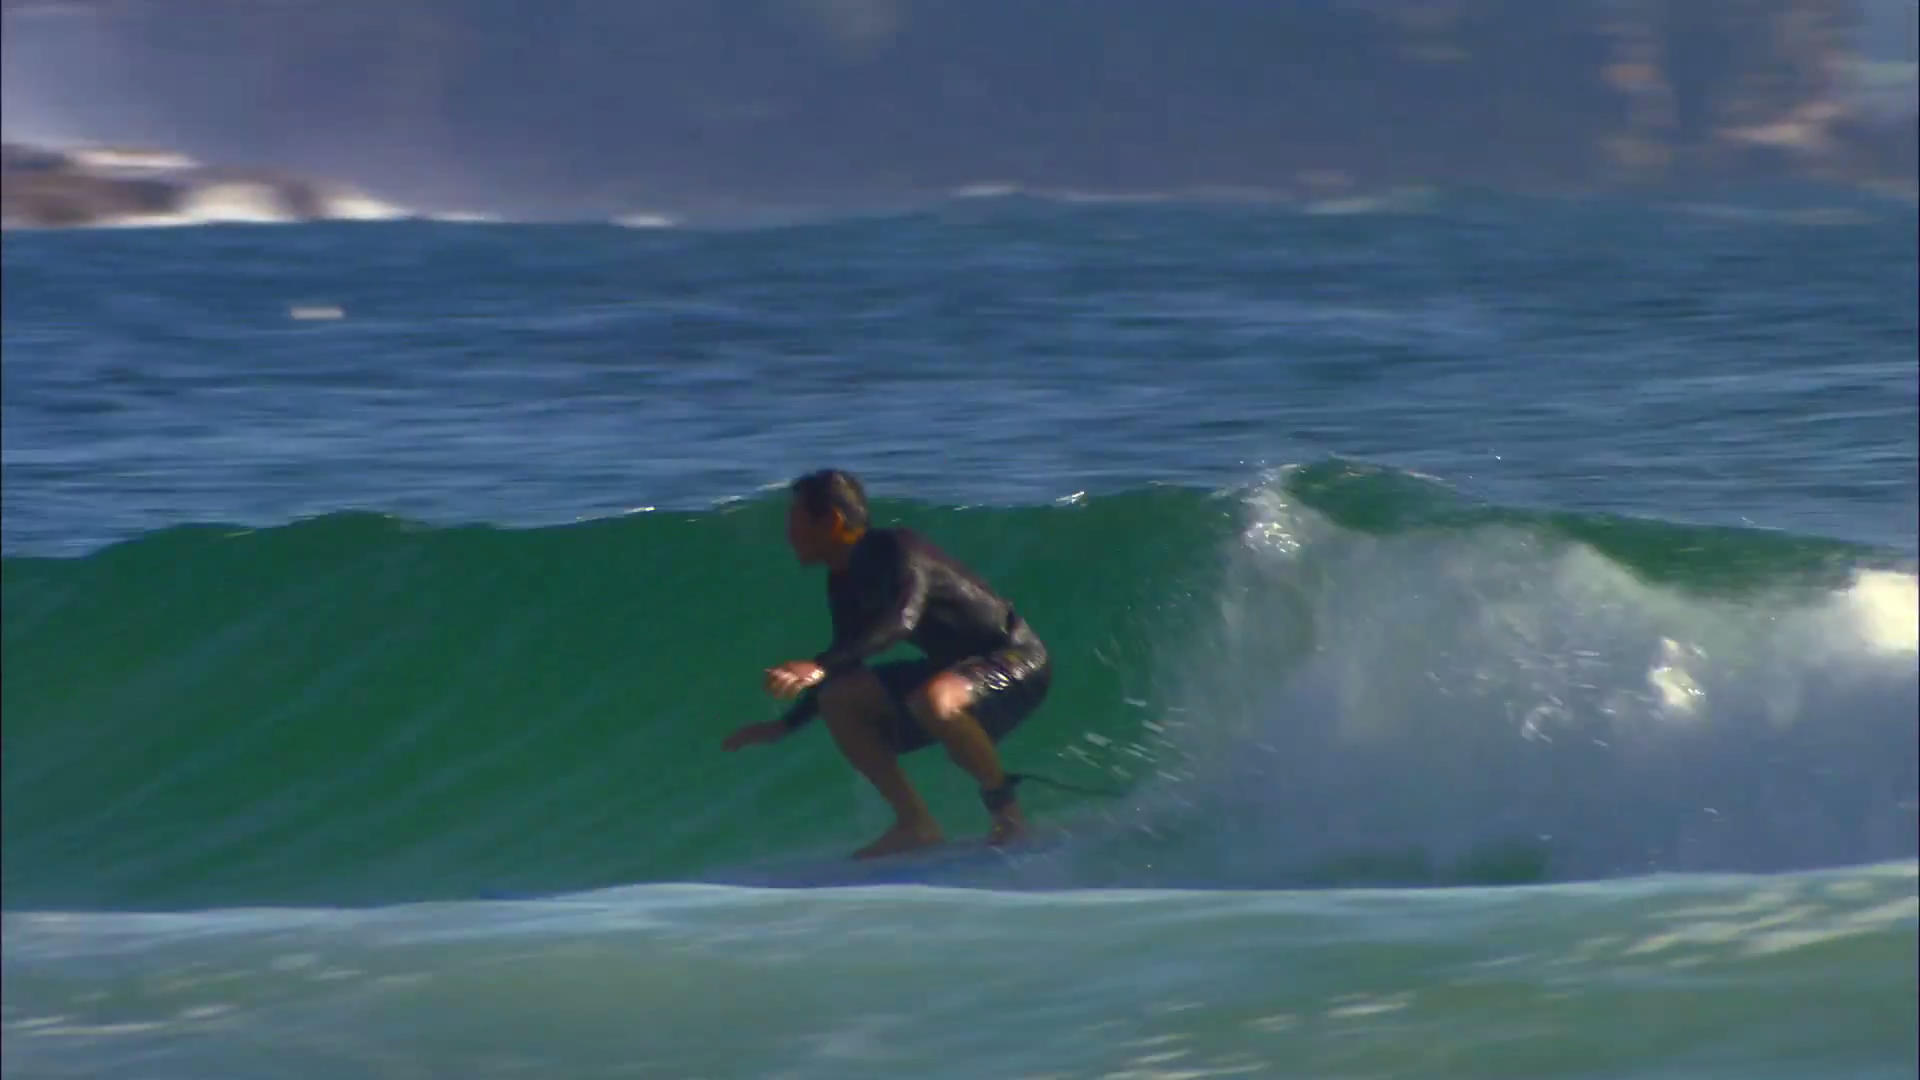 Surfer Jeff Dvd Surfer Jeff Song